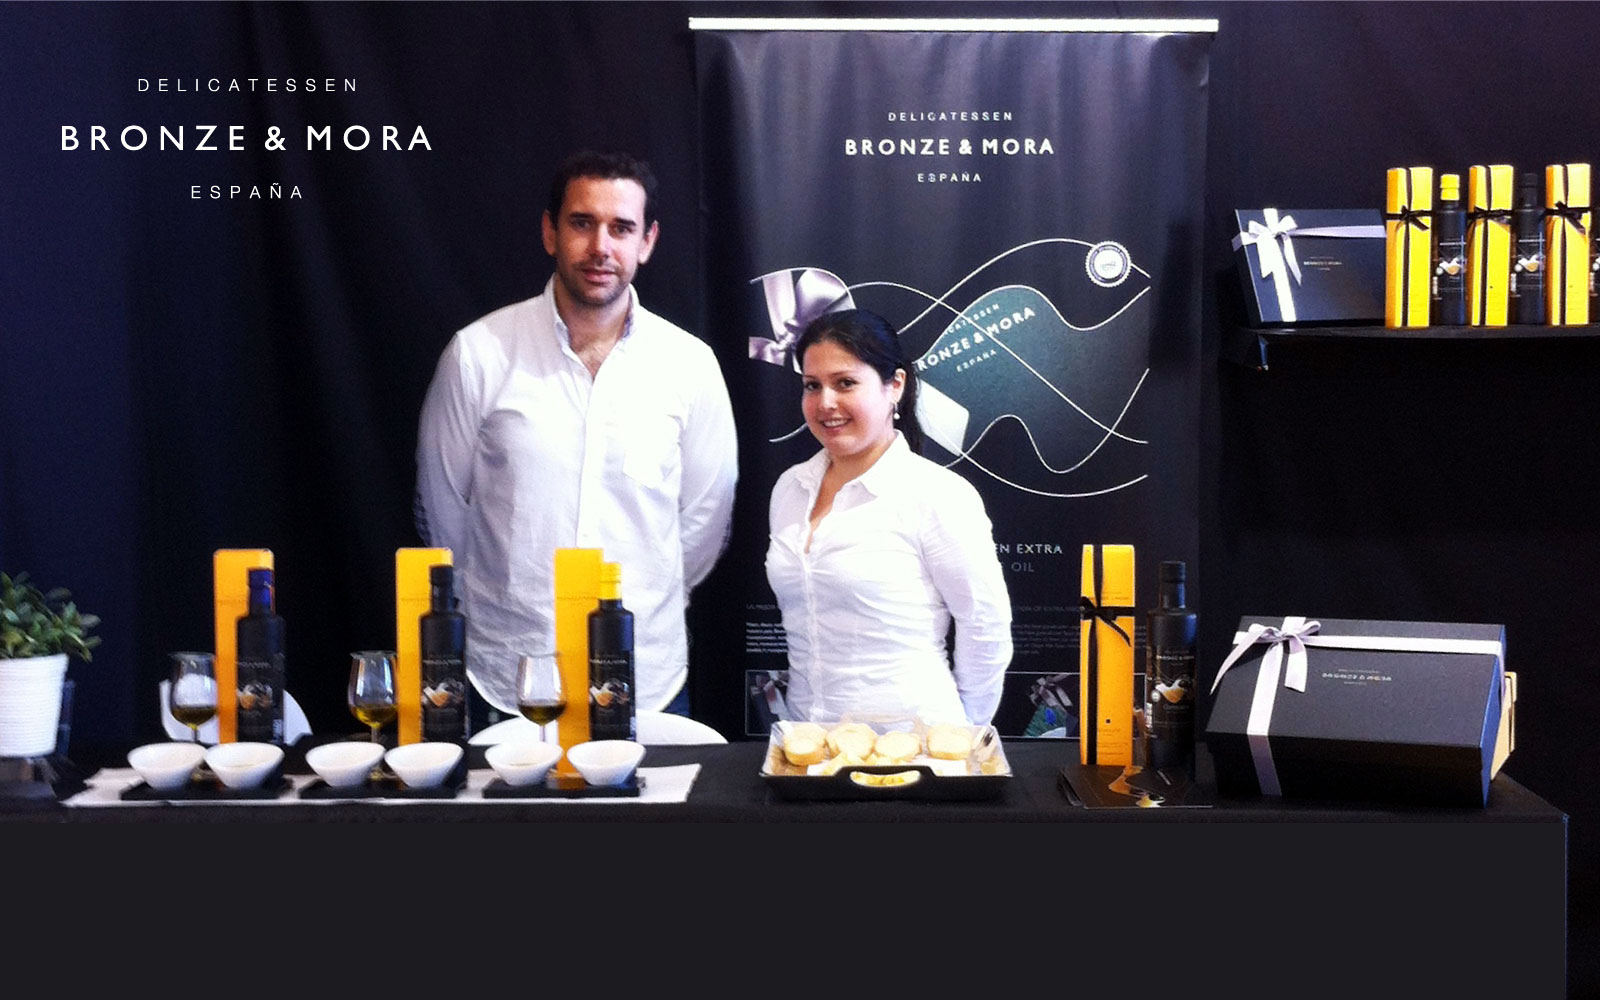 Feria-AOVE-costa-del-Sol-Bronze-&-Mora-el-mejor-aceite-de-oliva-virgen-extra-1